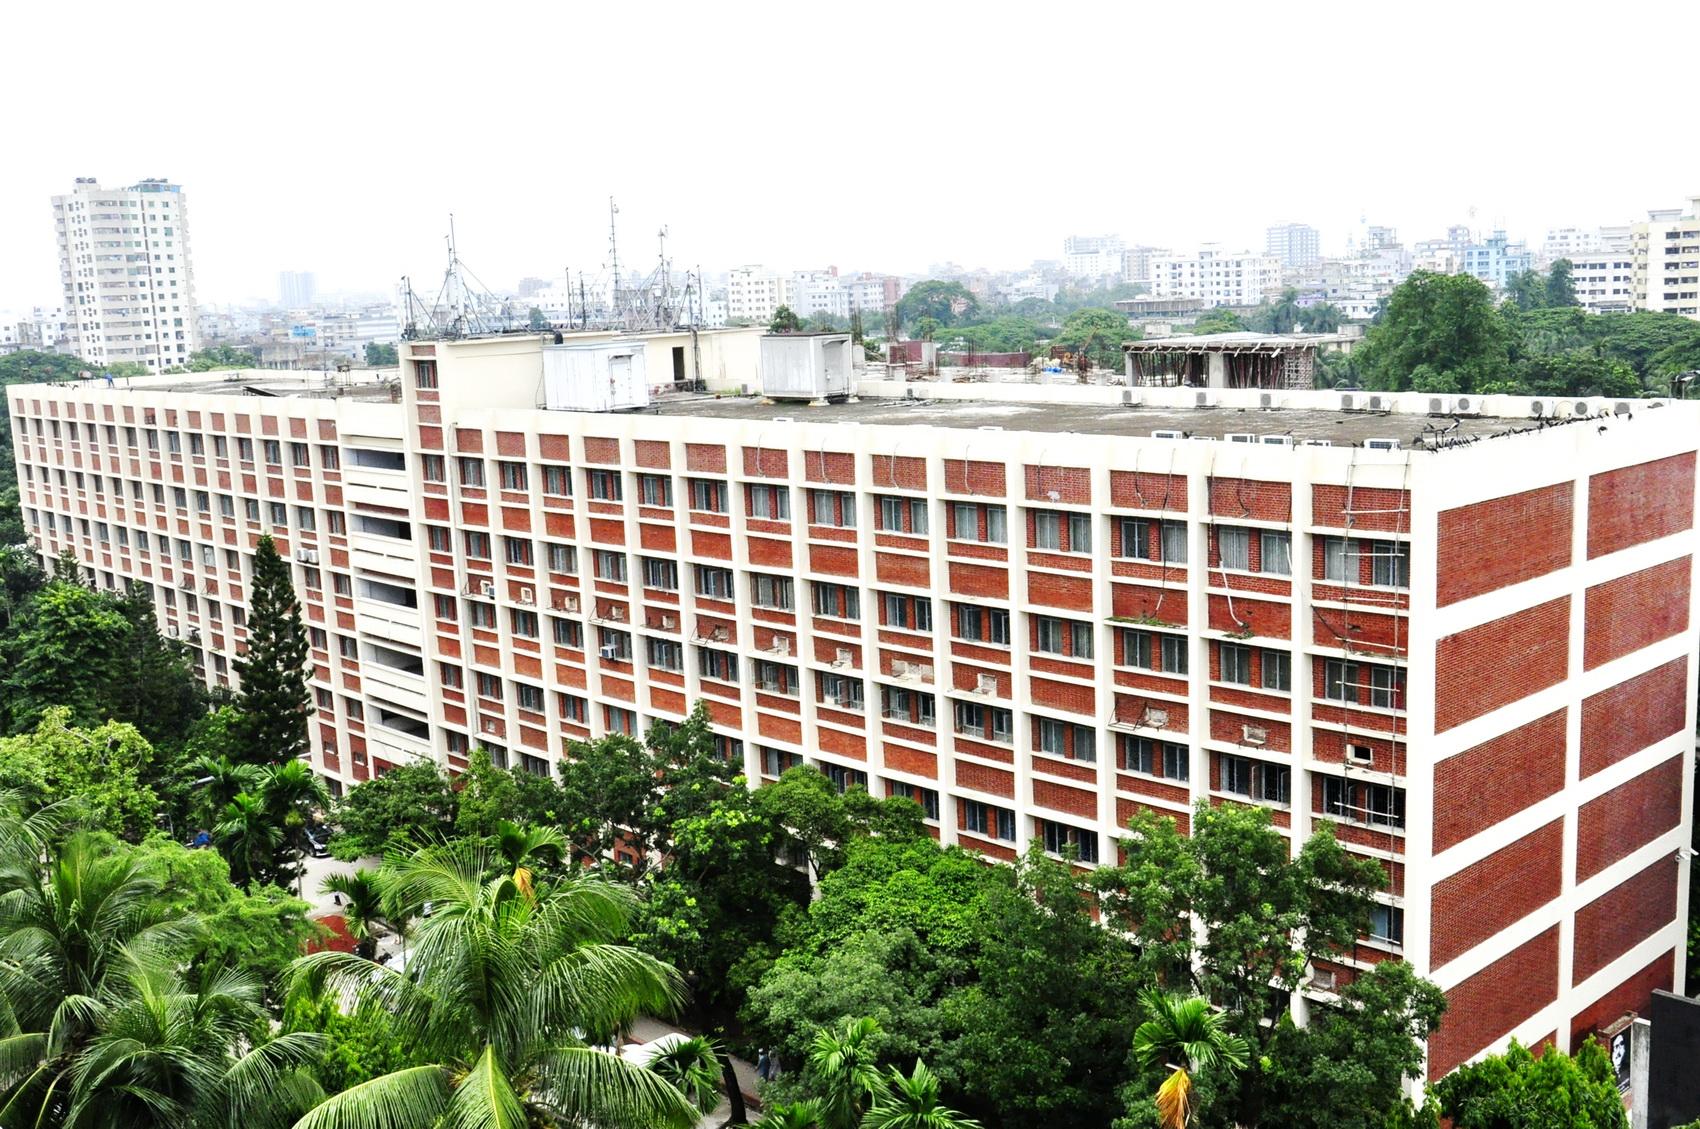 Bangladesh University of Engineering and Technology - BUET